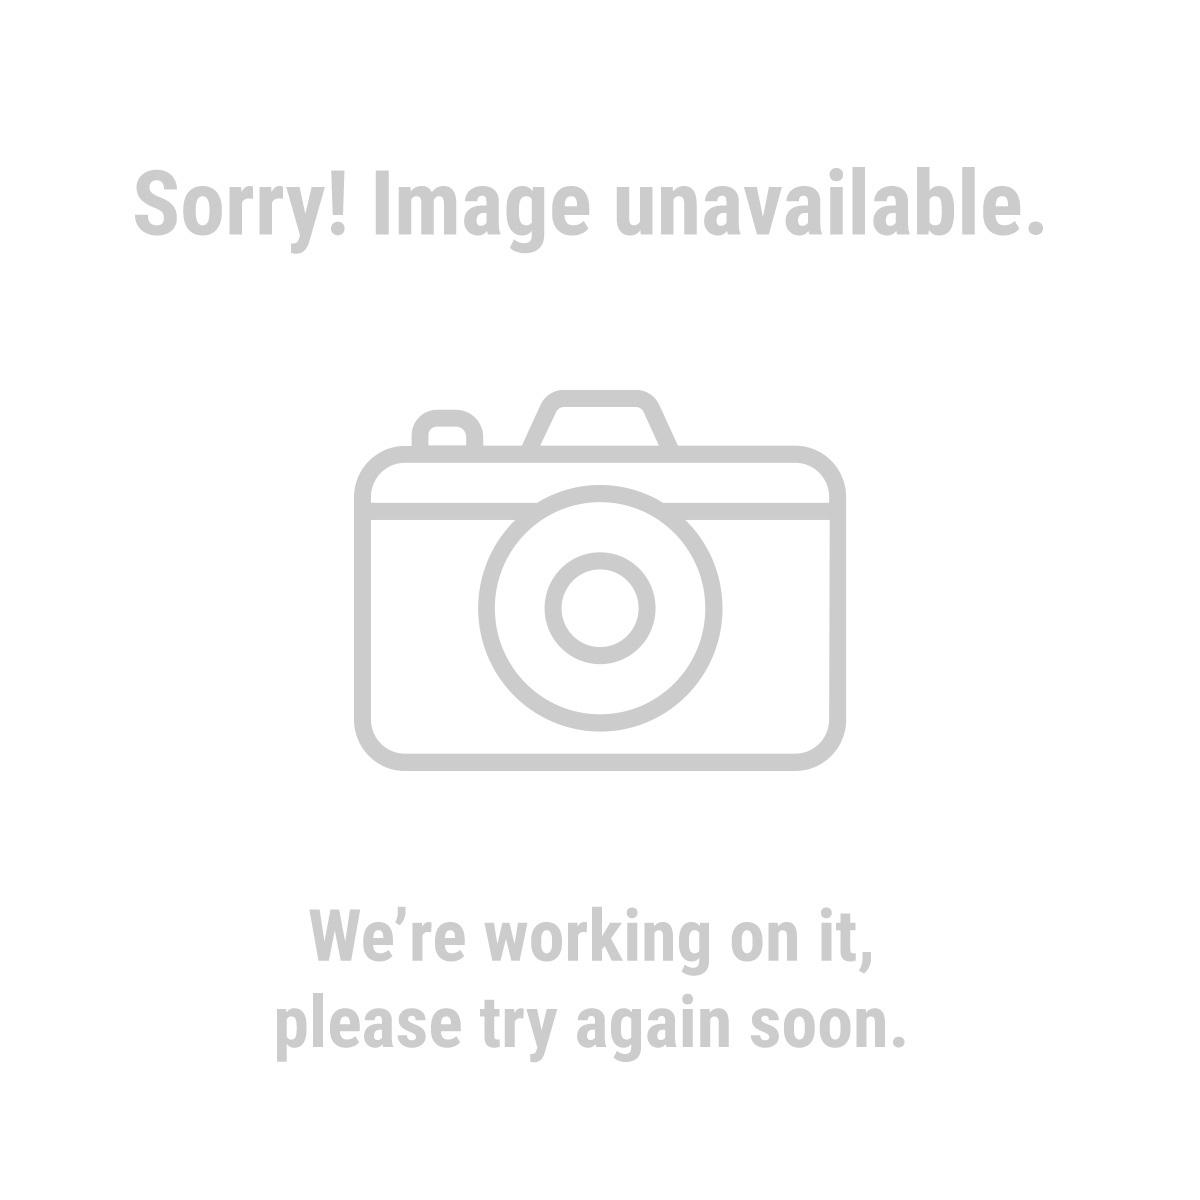 Haul-Master 66728 E-Track Ring